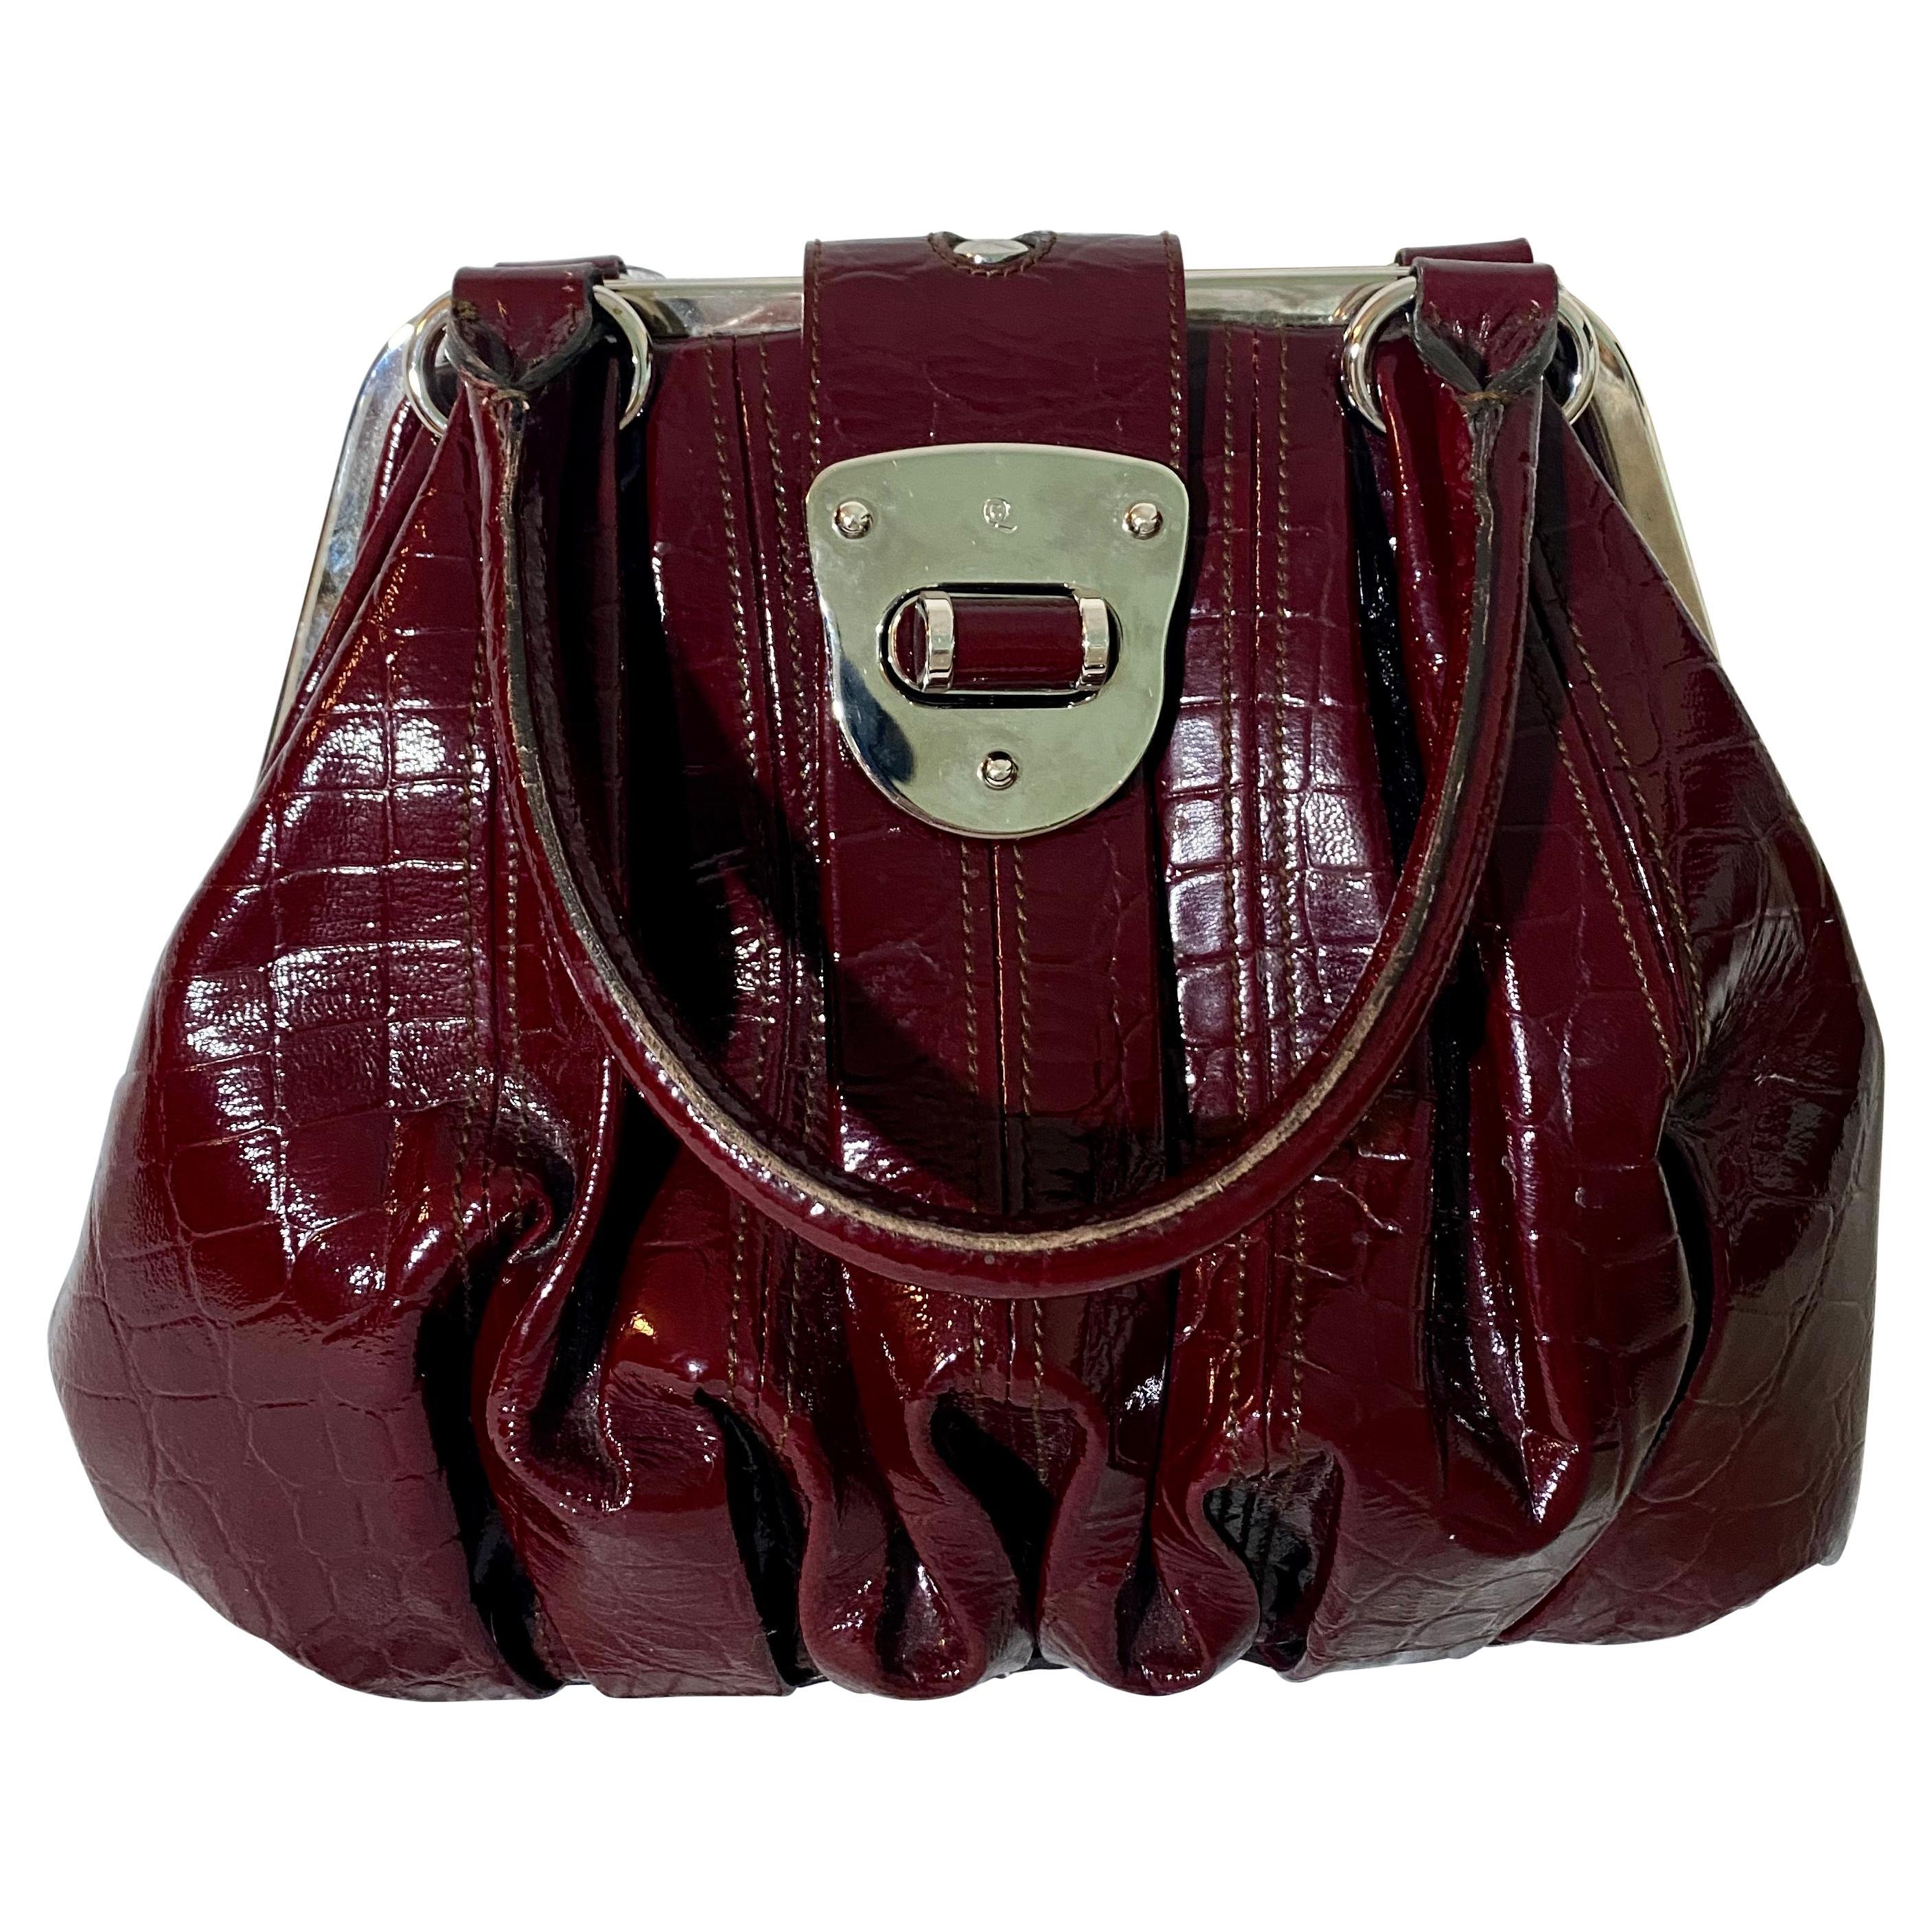 Alexander McQueen Red Crocodile Leather Elvie Bag